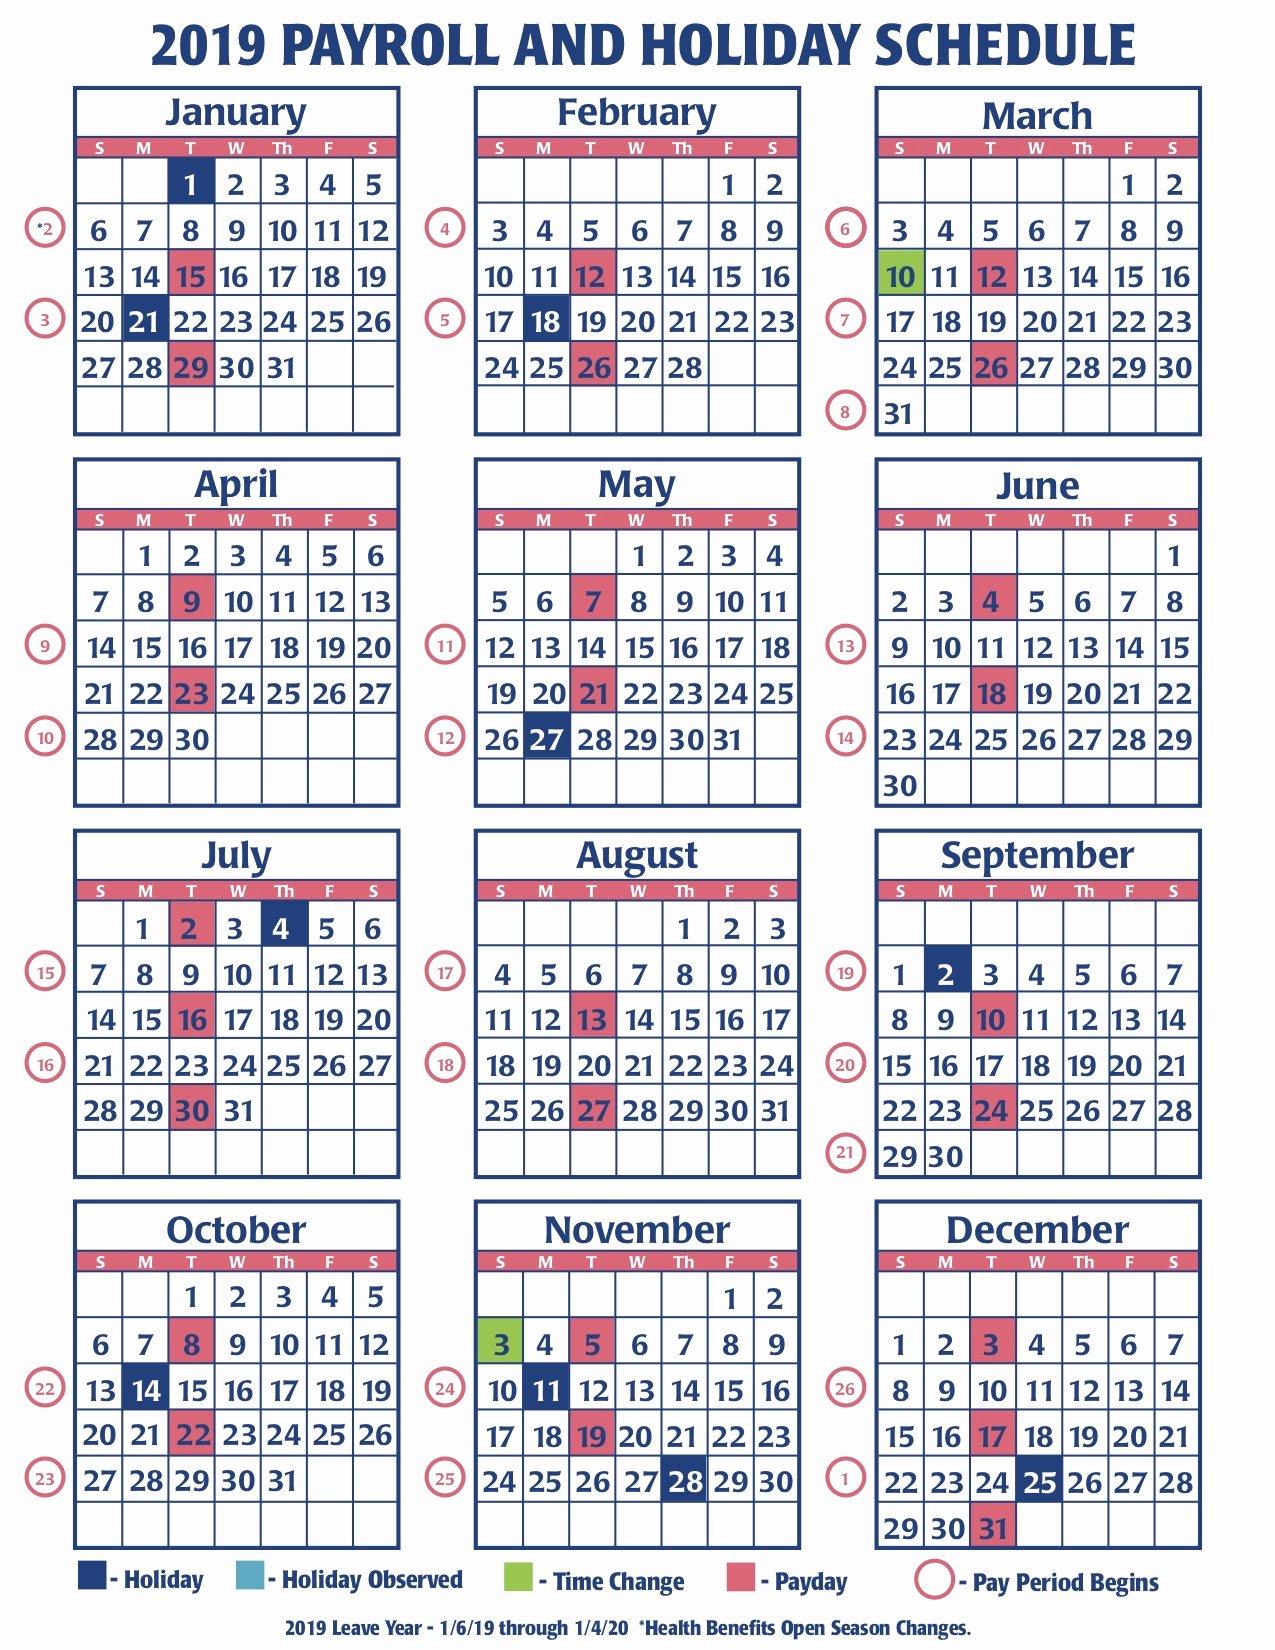 Payroll Calendar Template 2019 Fresh Weekly Payroll Calendar for 2019